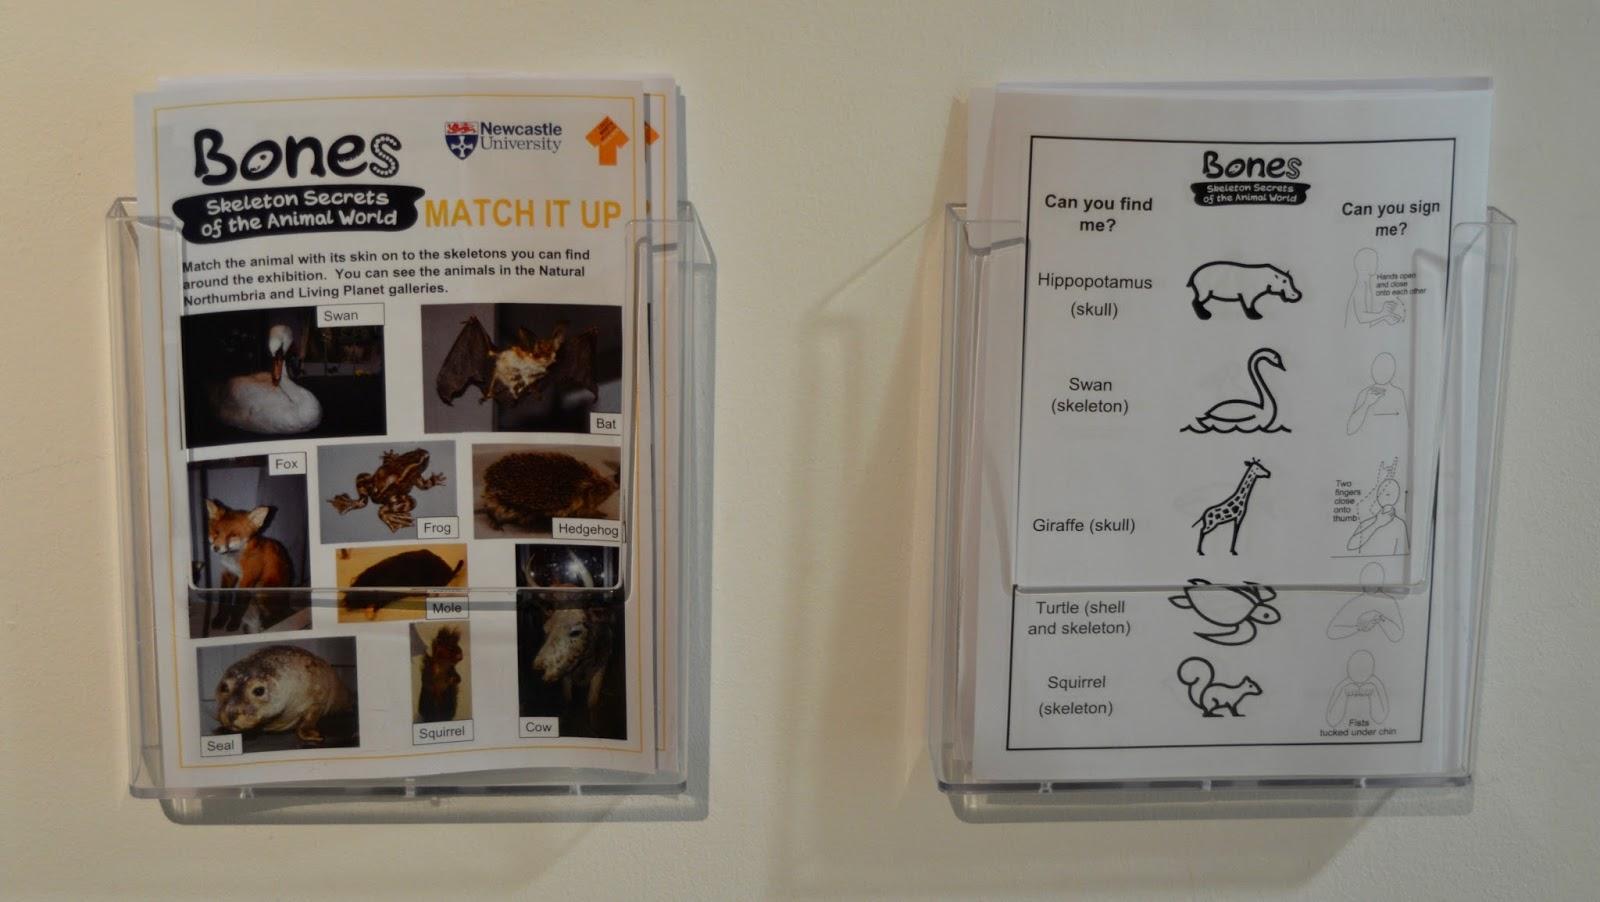 Bones Exhibition at Hancock Museum, Newcastle - activity sheets